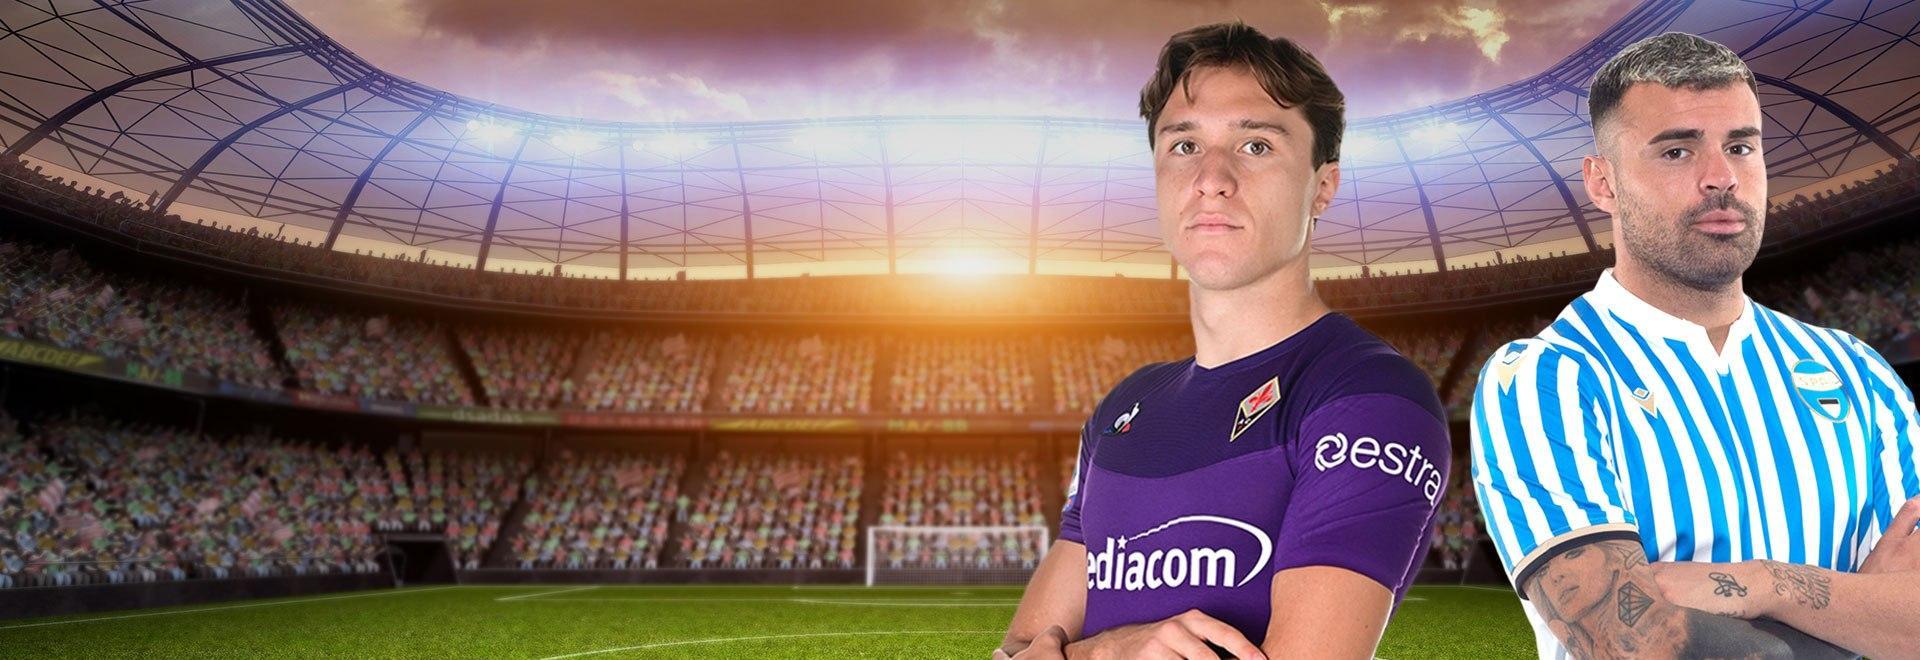 Fiorentina - Spal. 19a g.